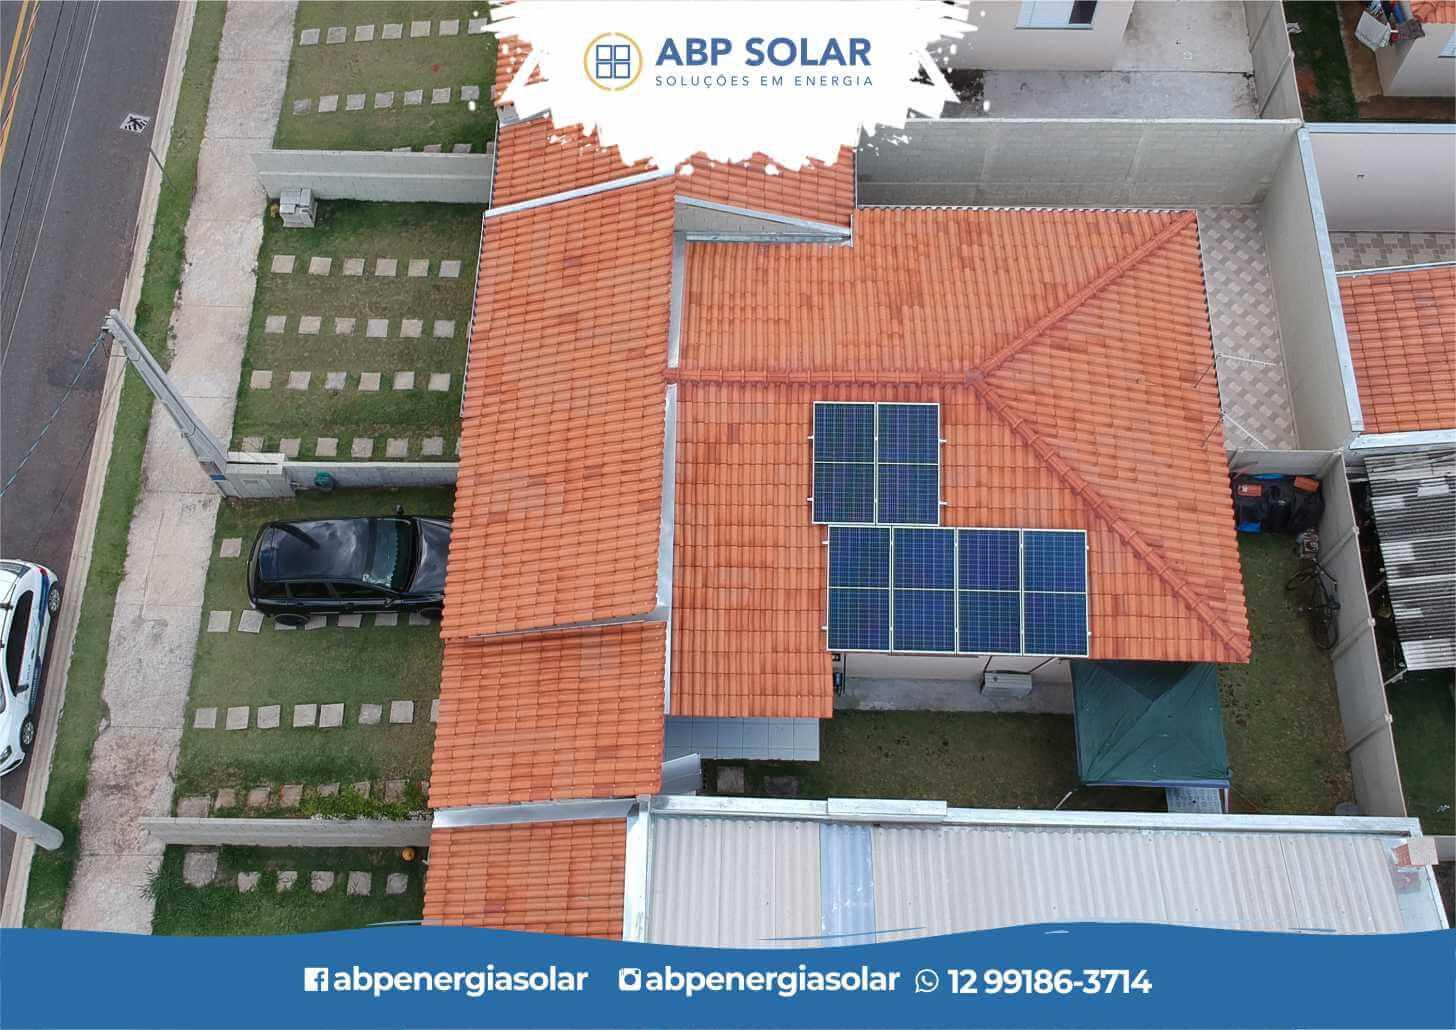 ABP SOLAR residencial